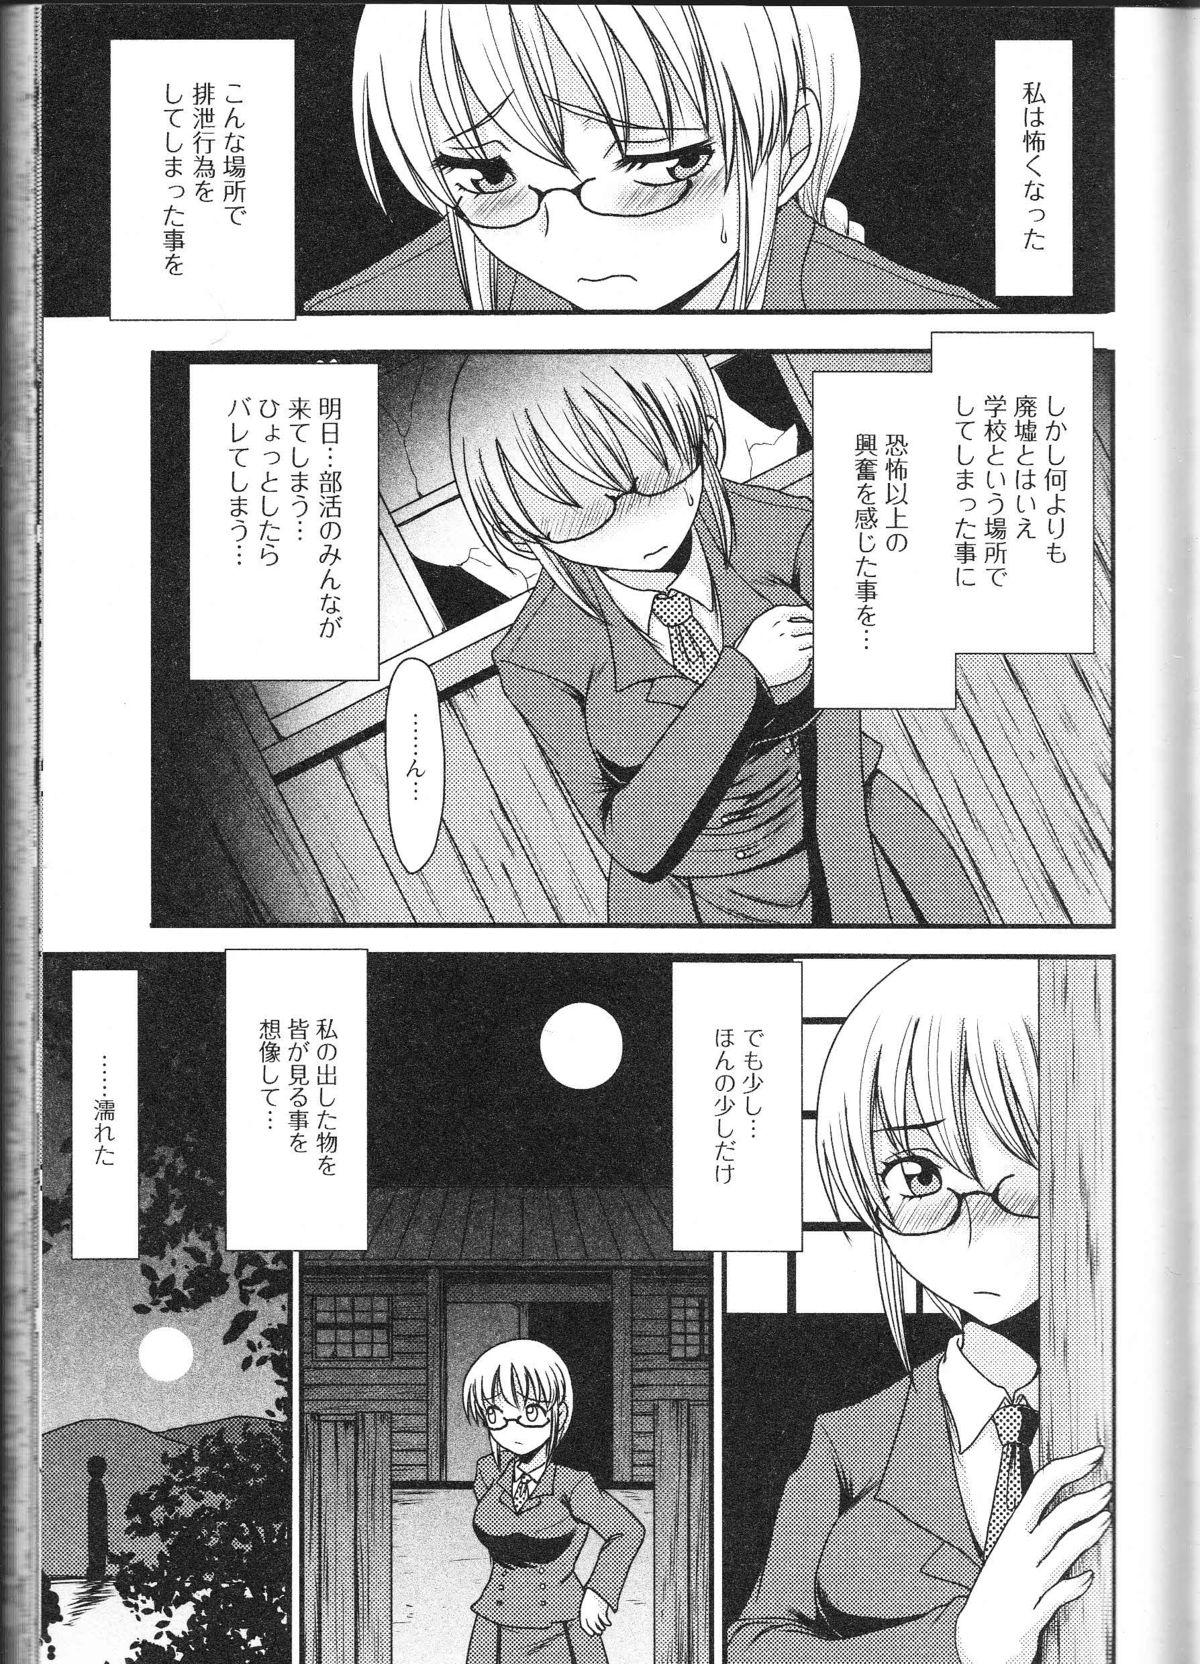 Nozoite wa Ikenai 9 - Do Not Peep! 9 109